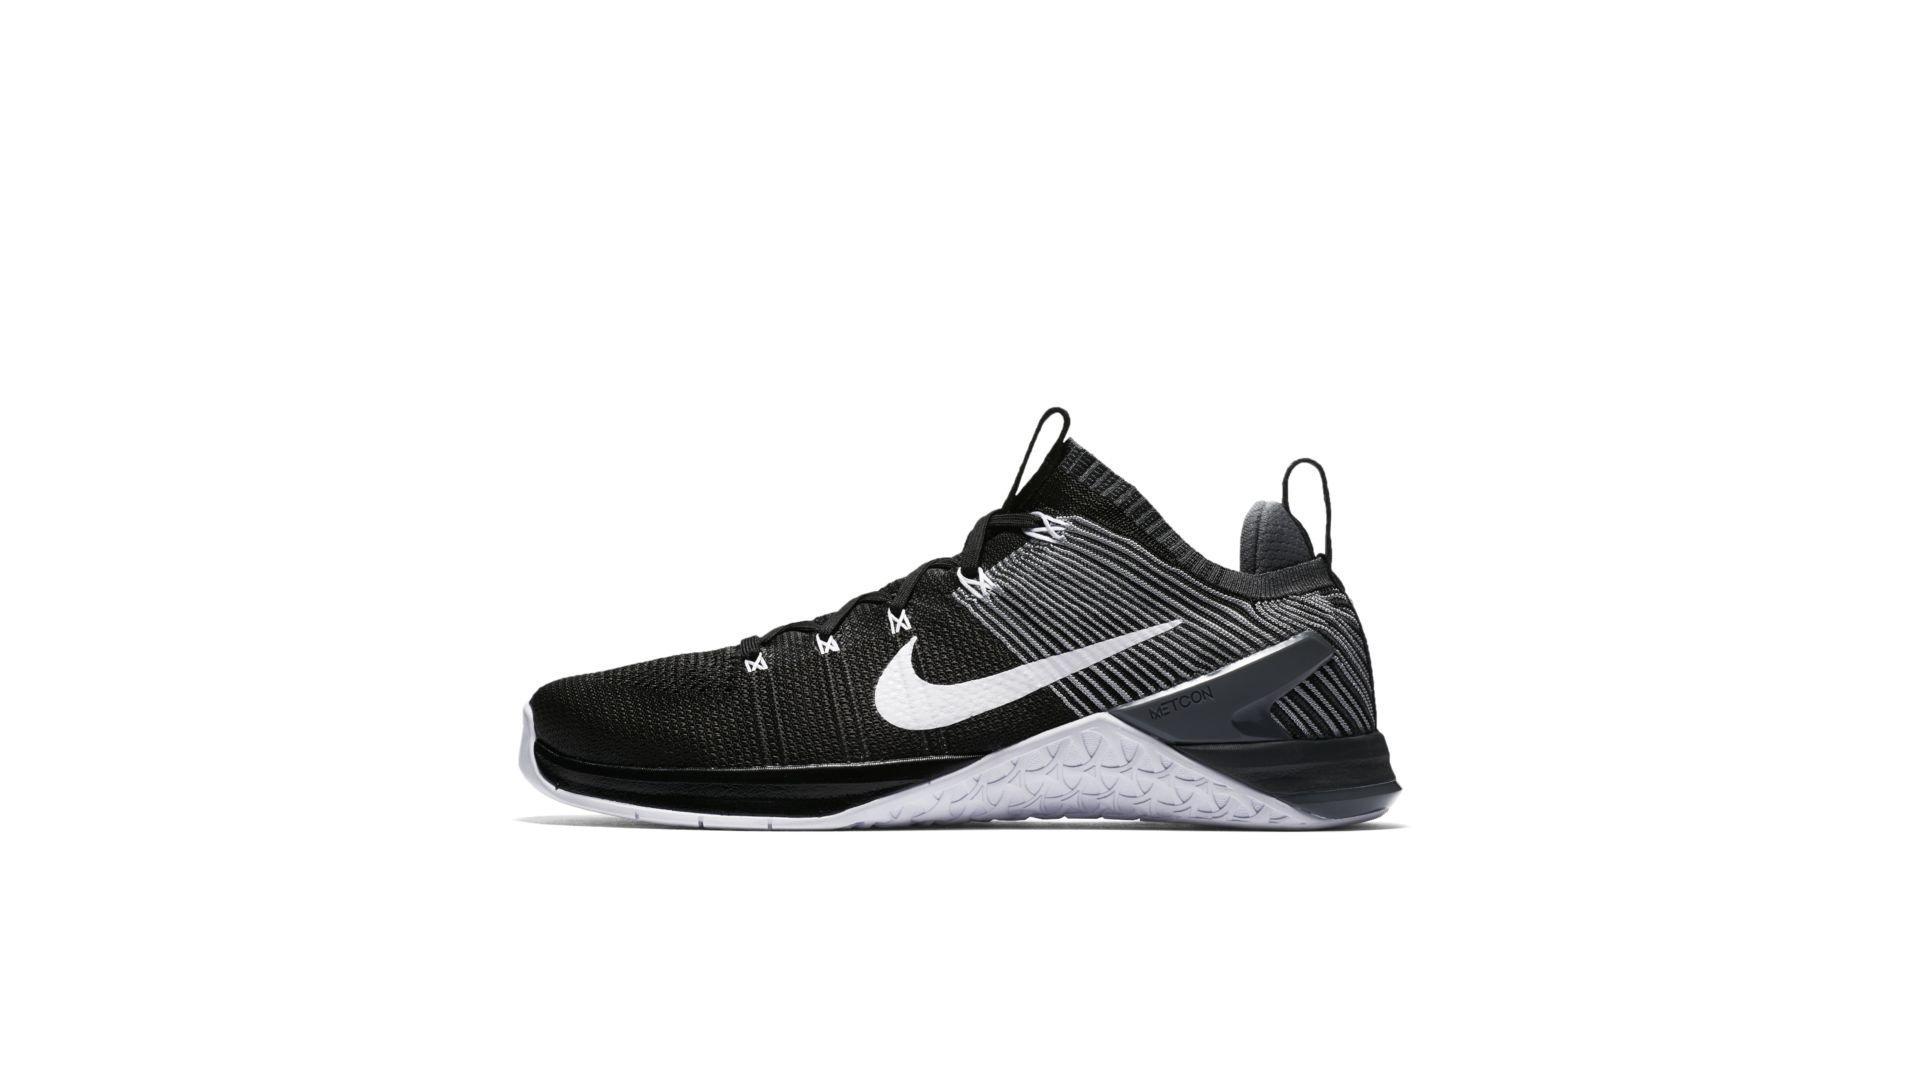 Nike Metcon DSX Flyknit 2 Black Grey White (924423-010)